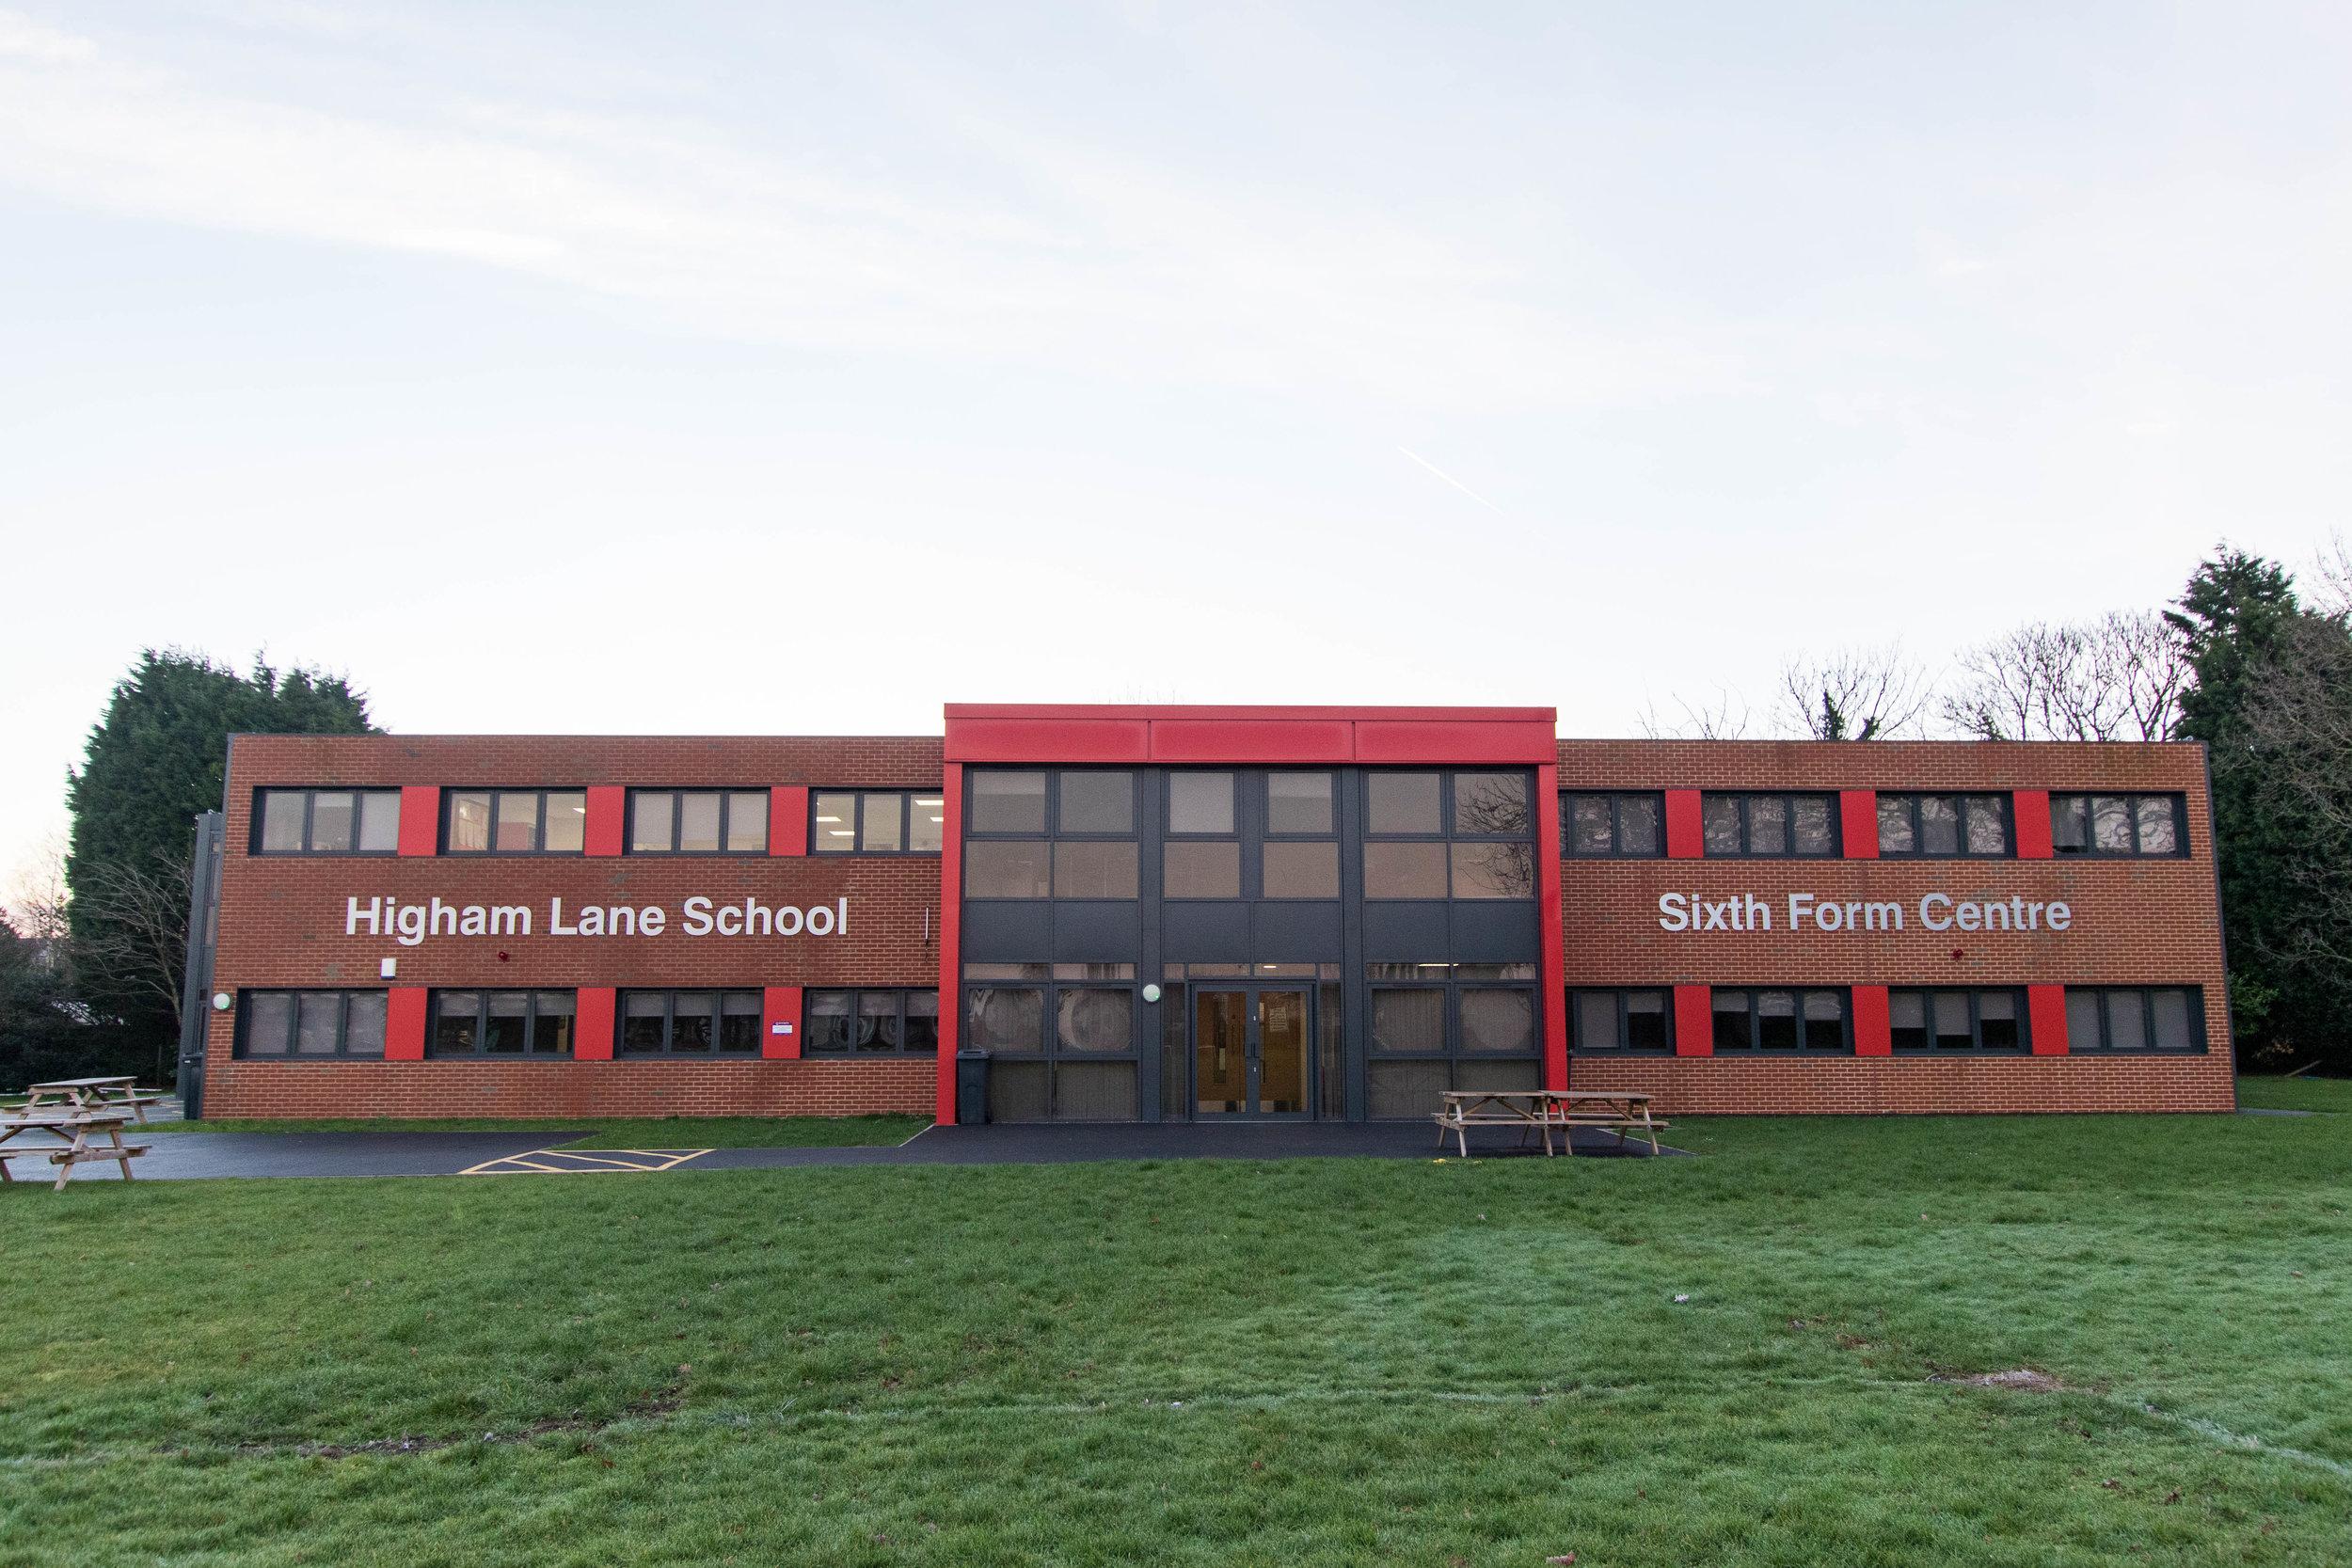 Higham Lane School